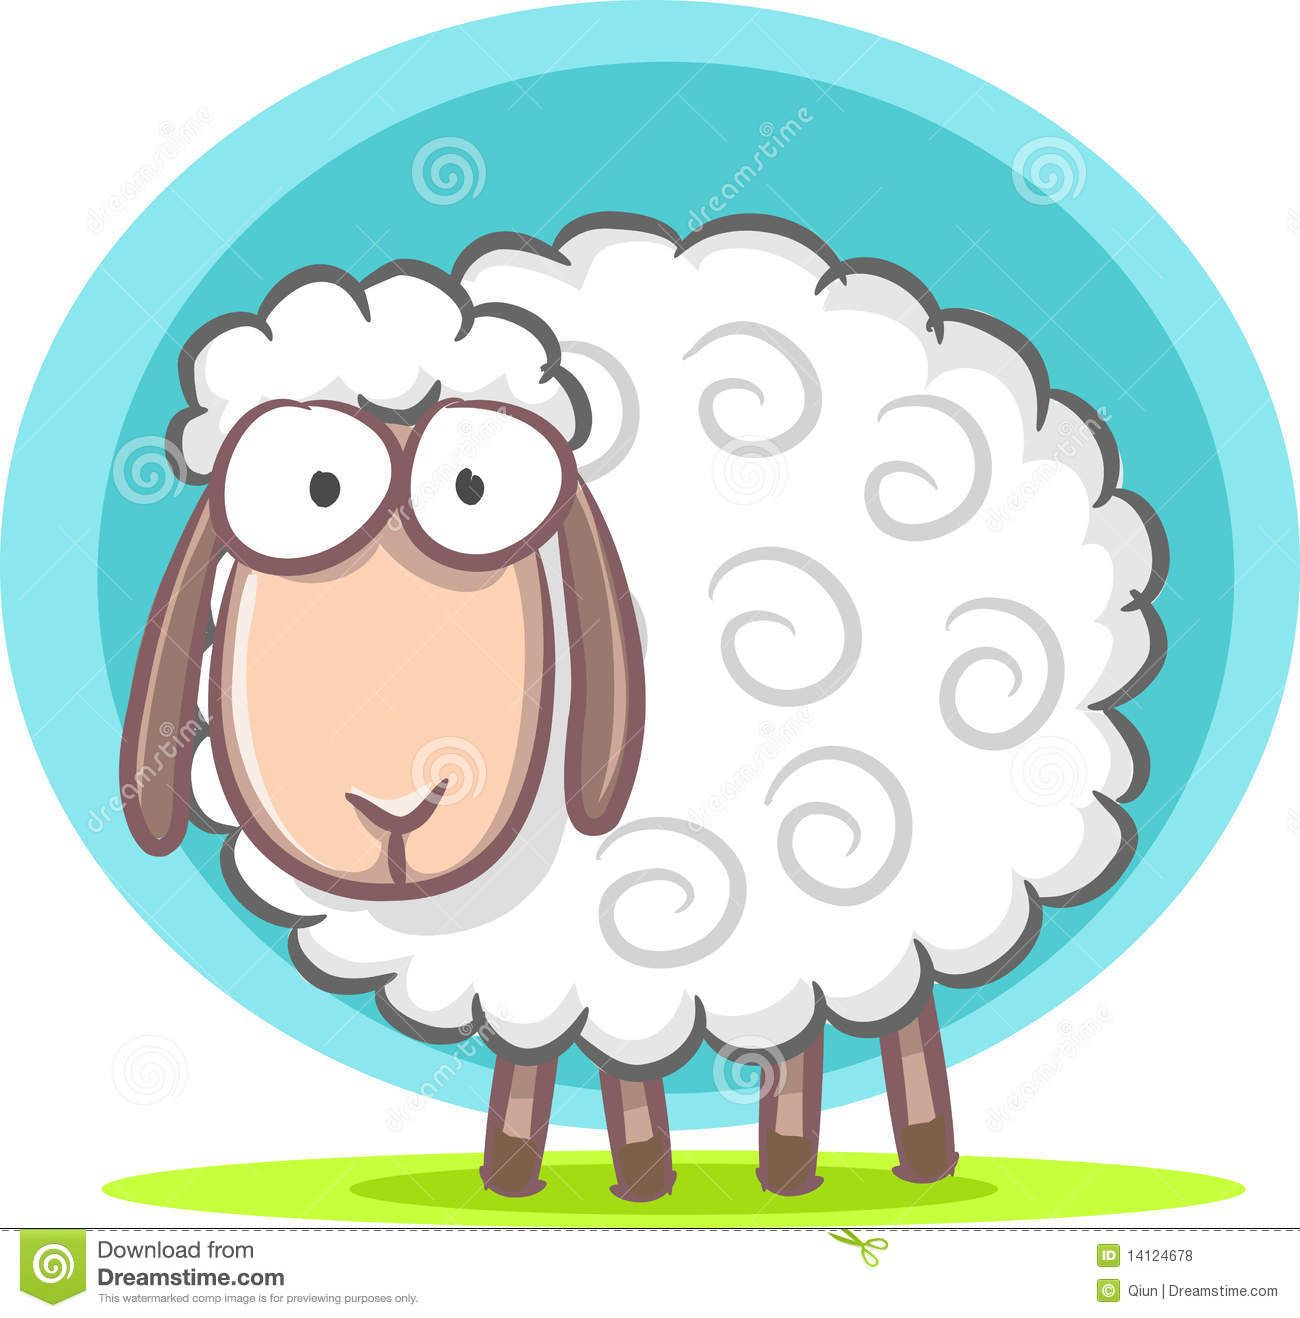 Dessin mouton mignon recherche google mind mapping - Mouton dessin anime ...